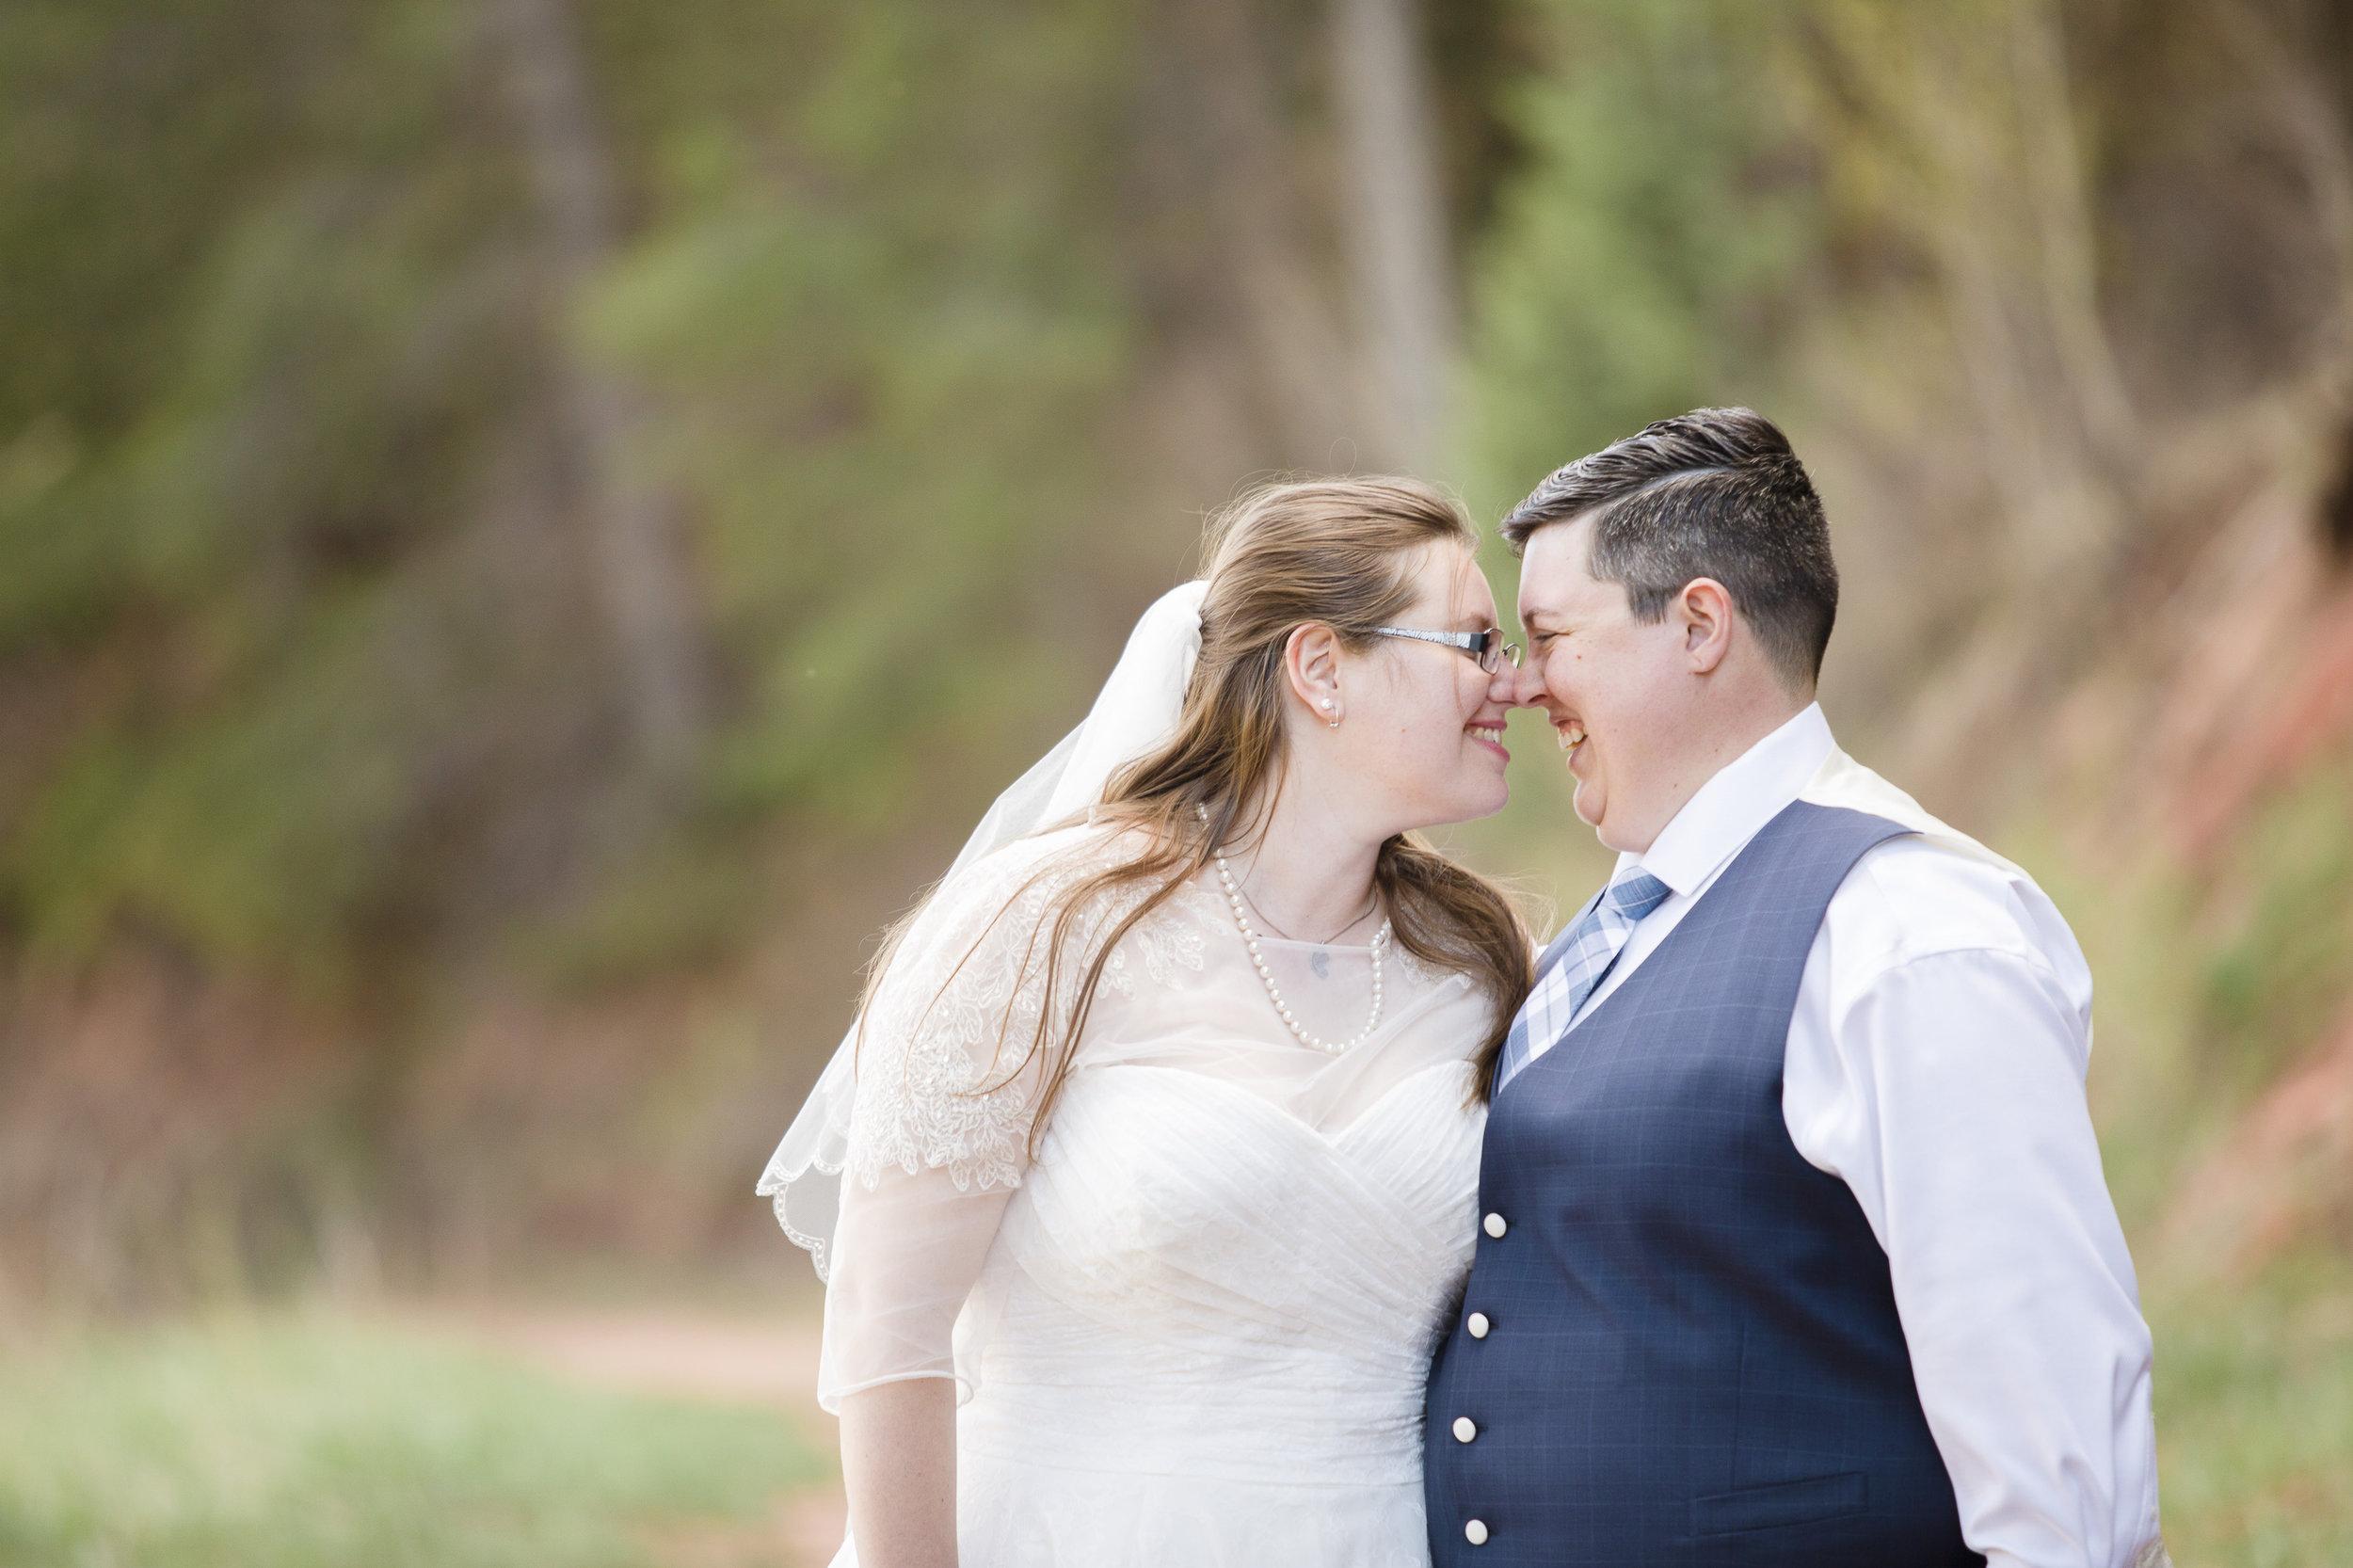 kristen-vance-sylvan-lake-eagle-colorado-wedding-2017.jpg